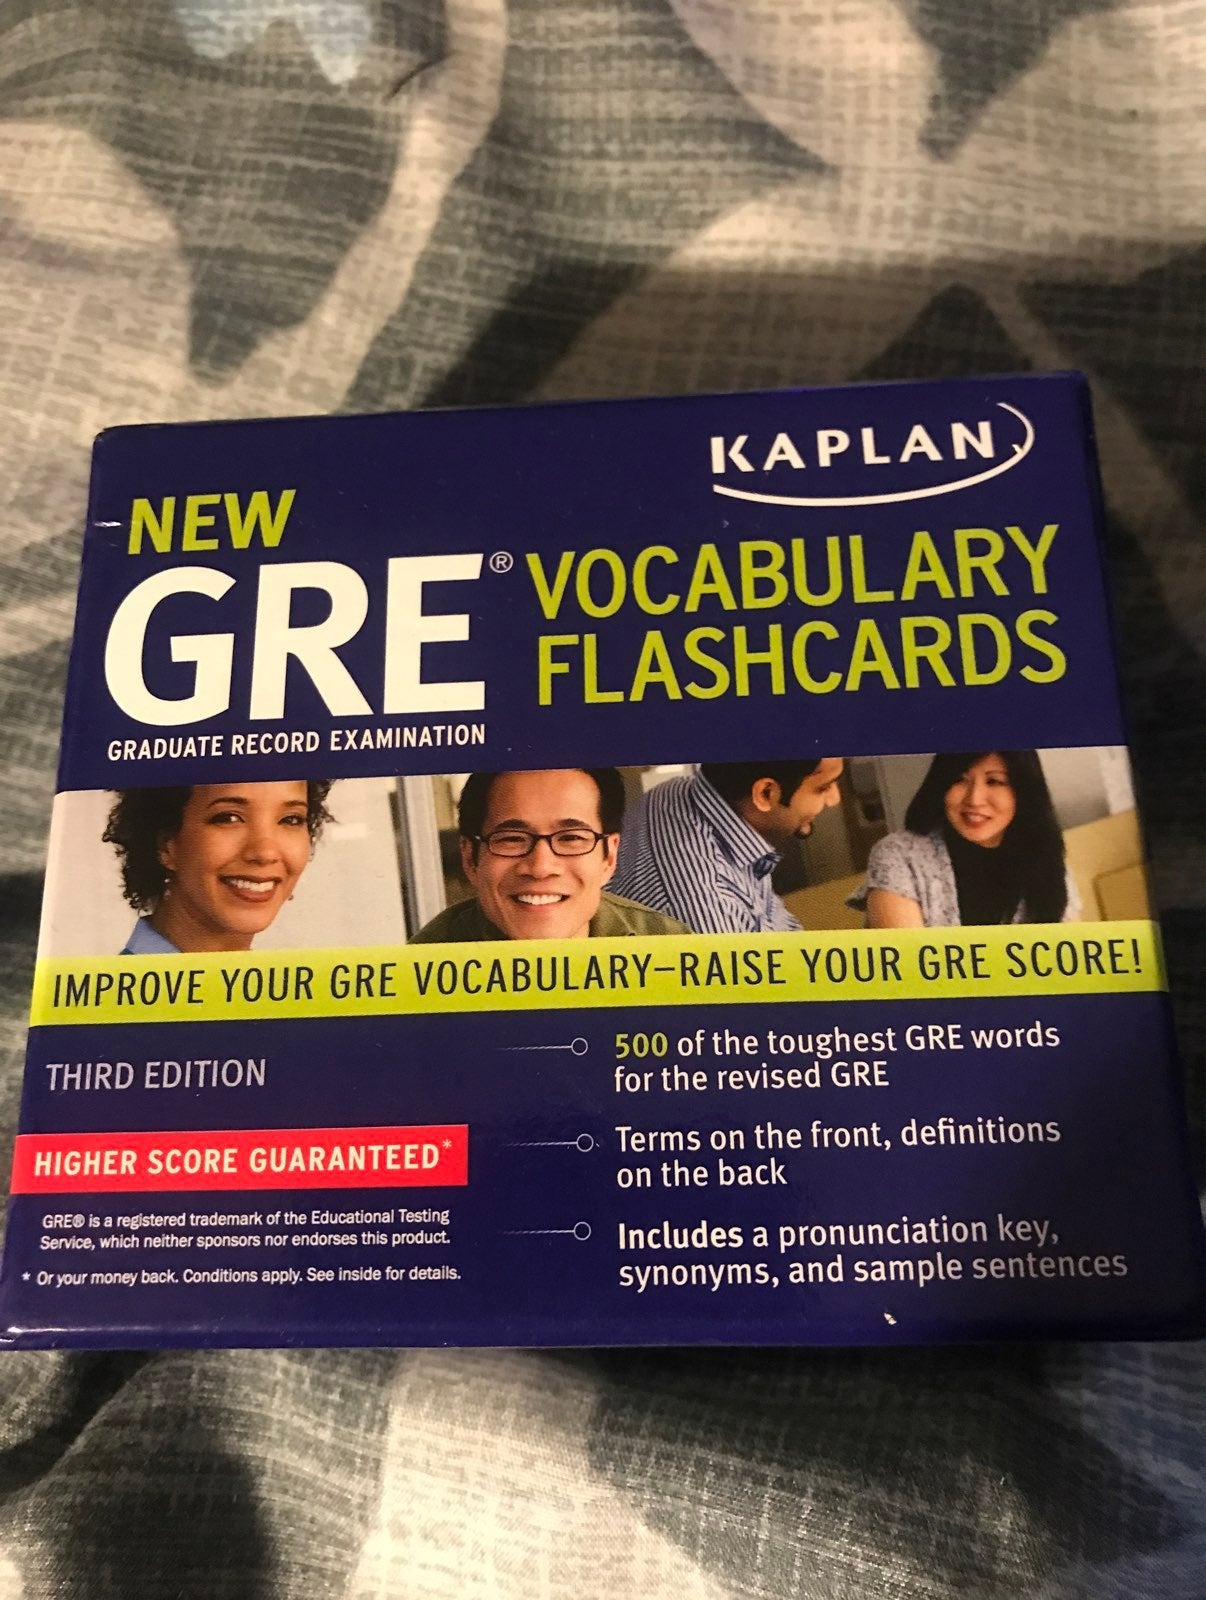 KAPLAN GRE vocab flashcards 3rd edition